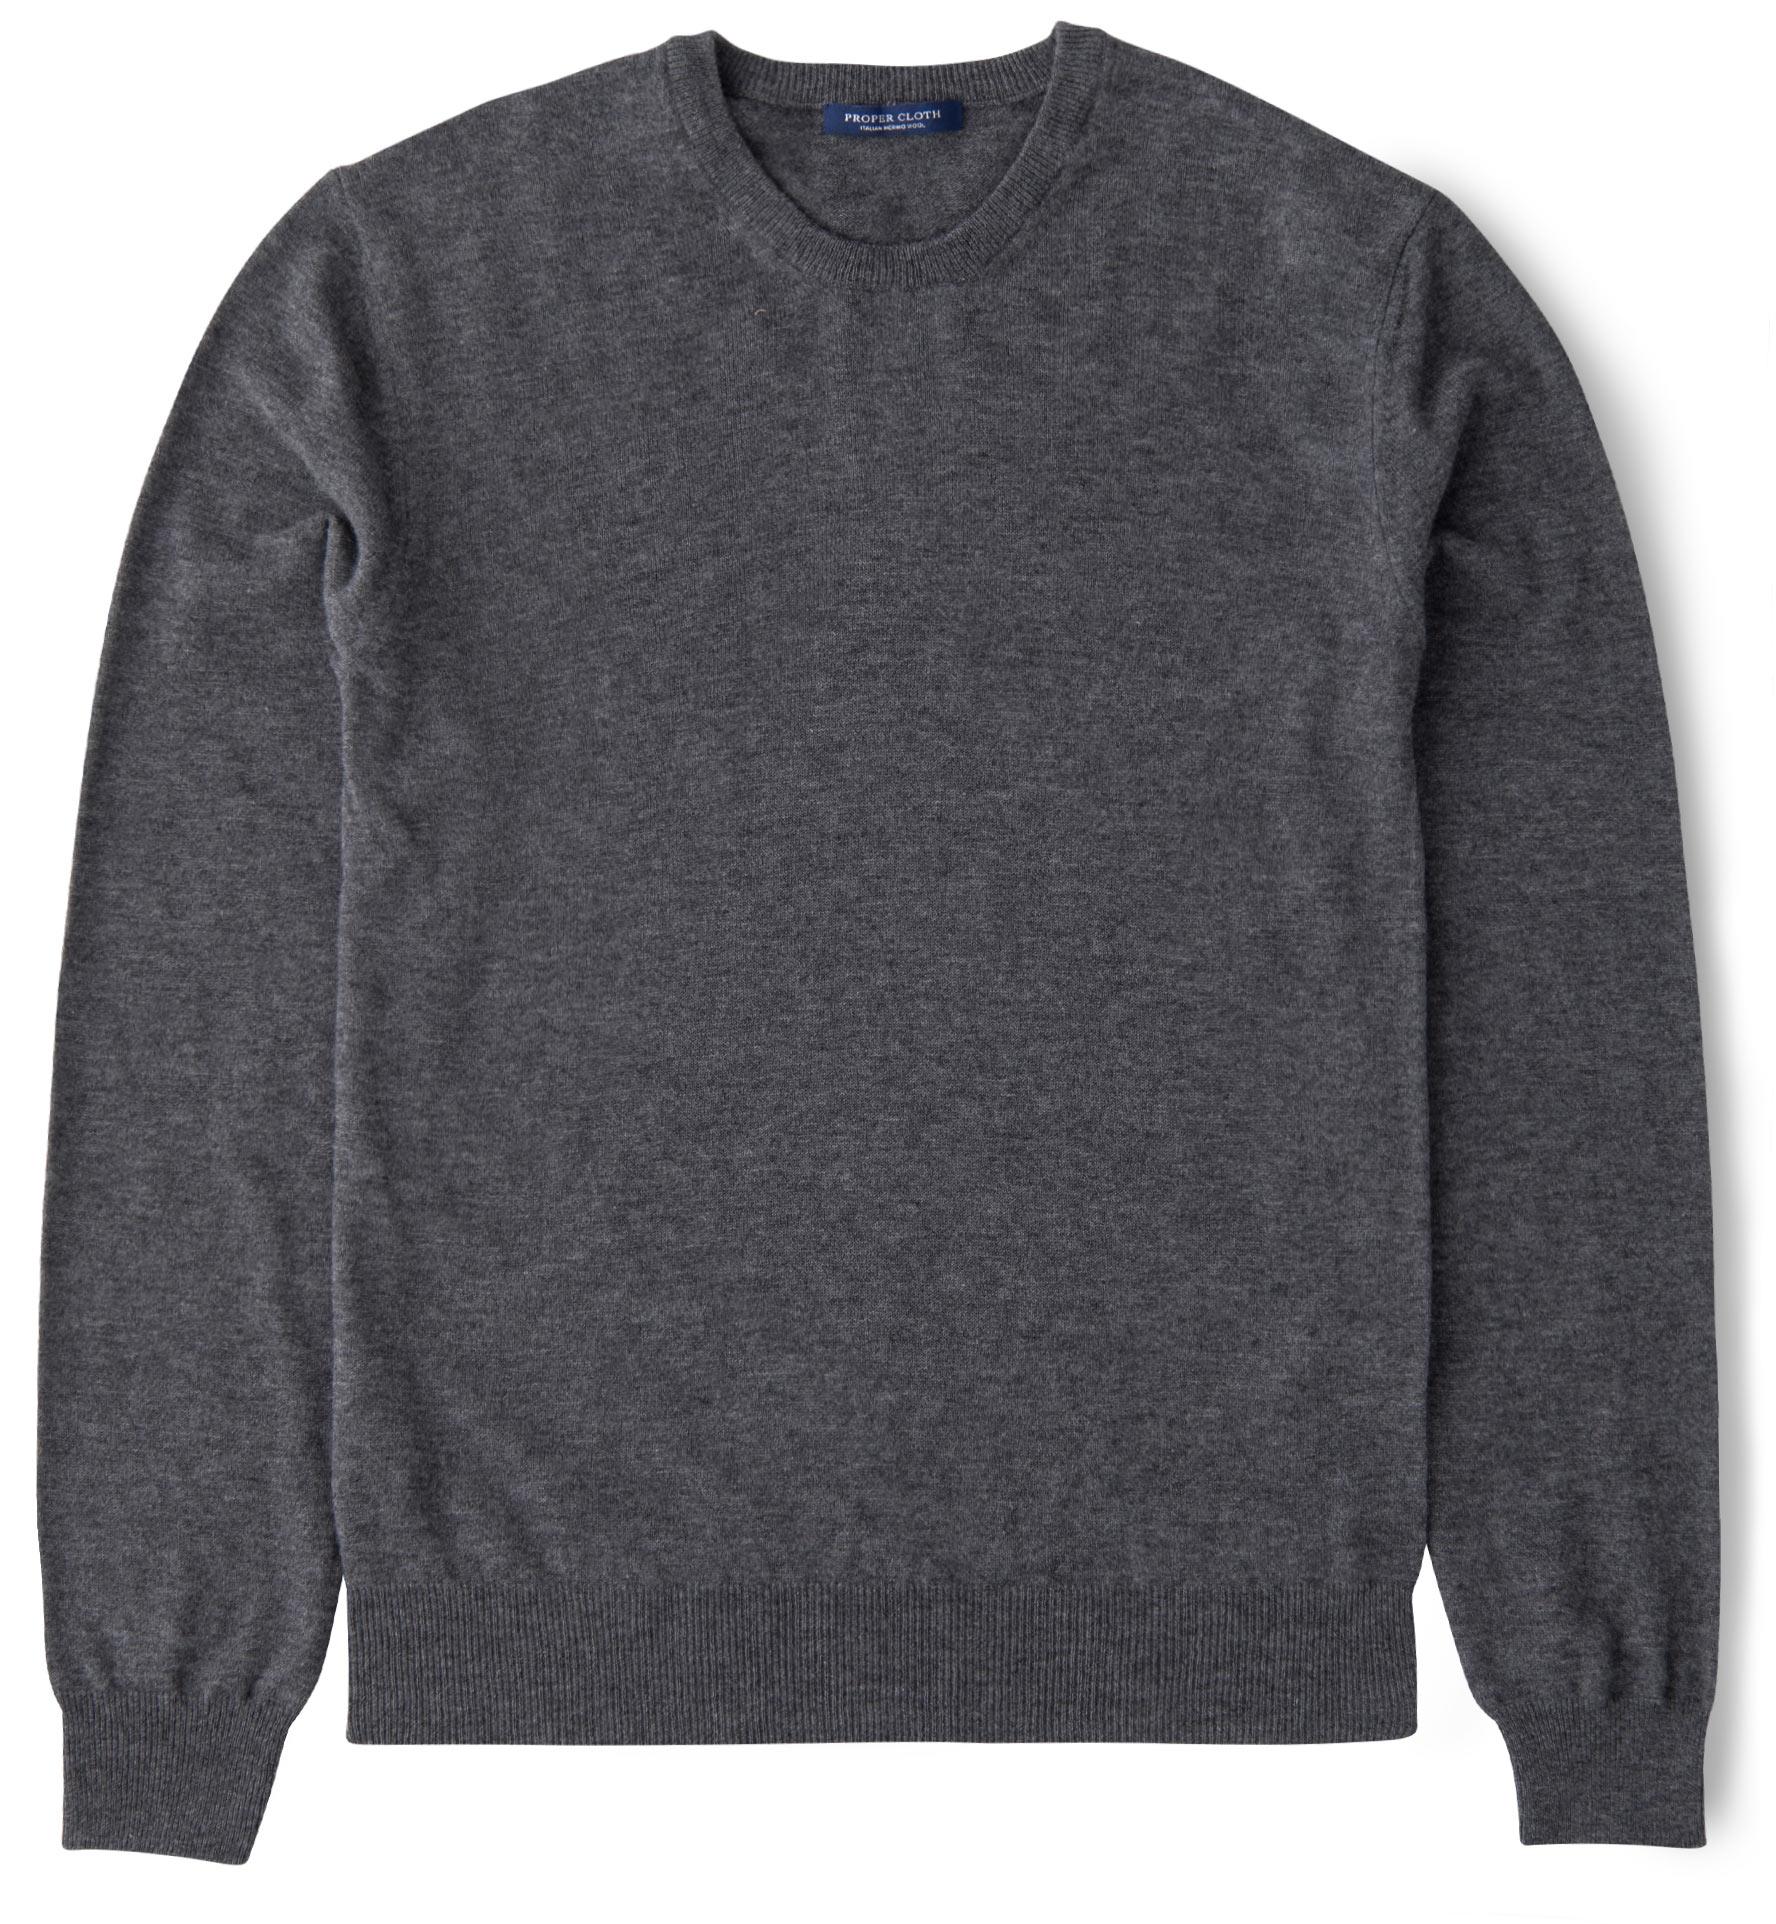 Zoom Image of Grey Melange Merino Crewneck Sweater